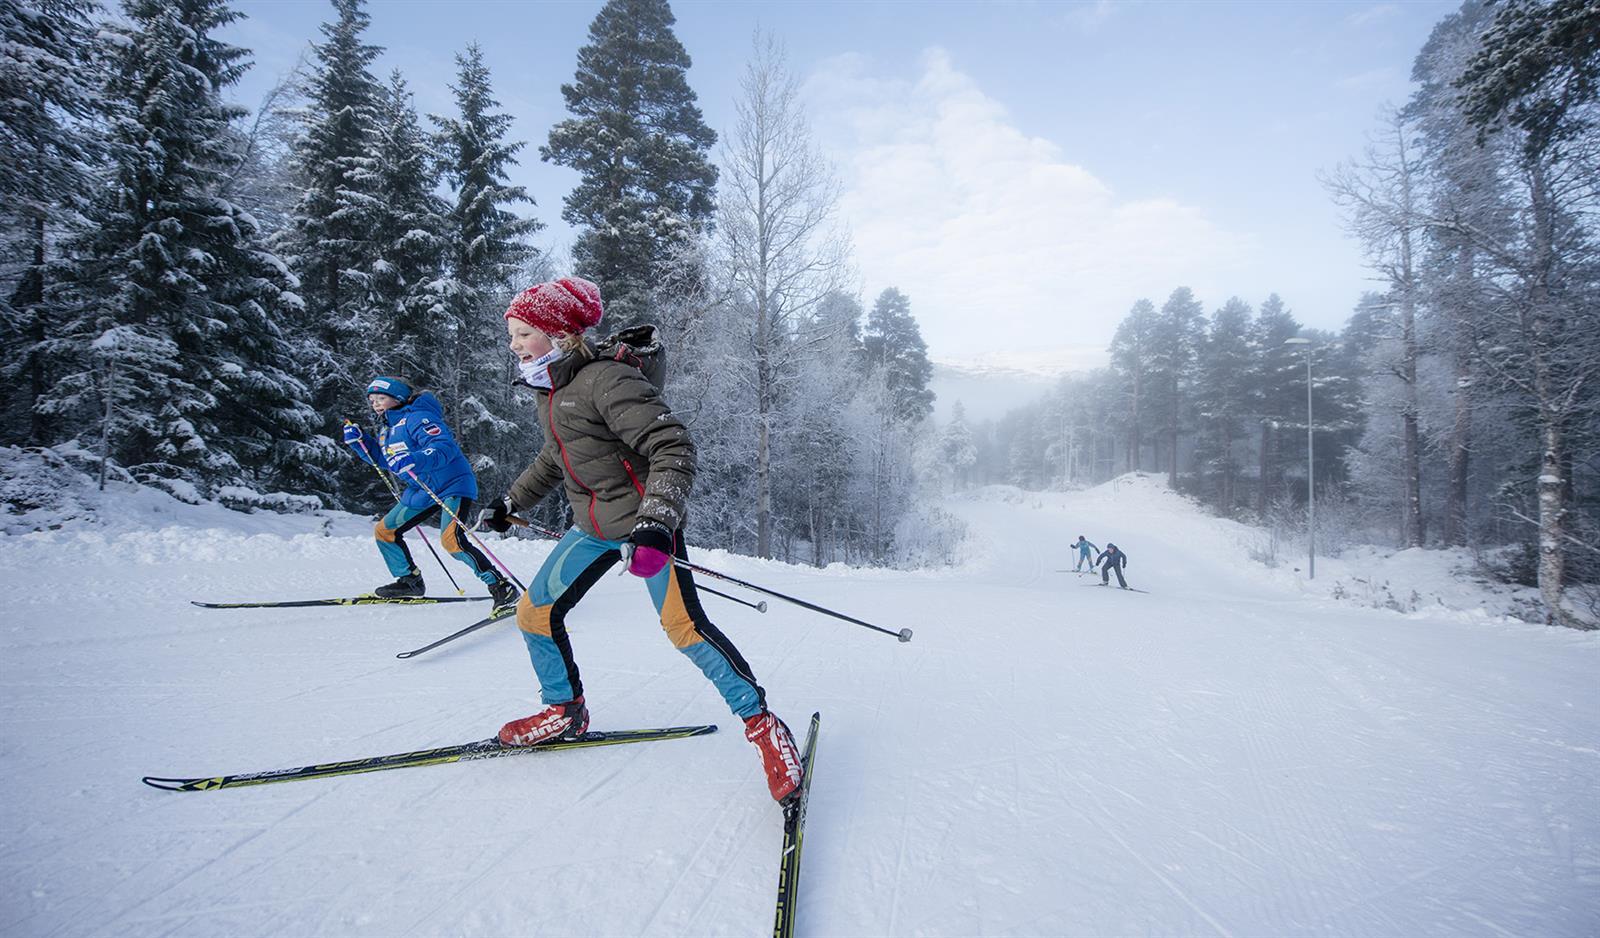 Oppdal skistadion